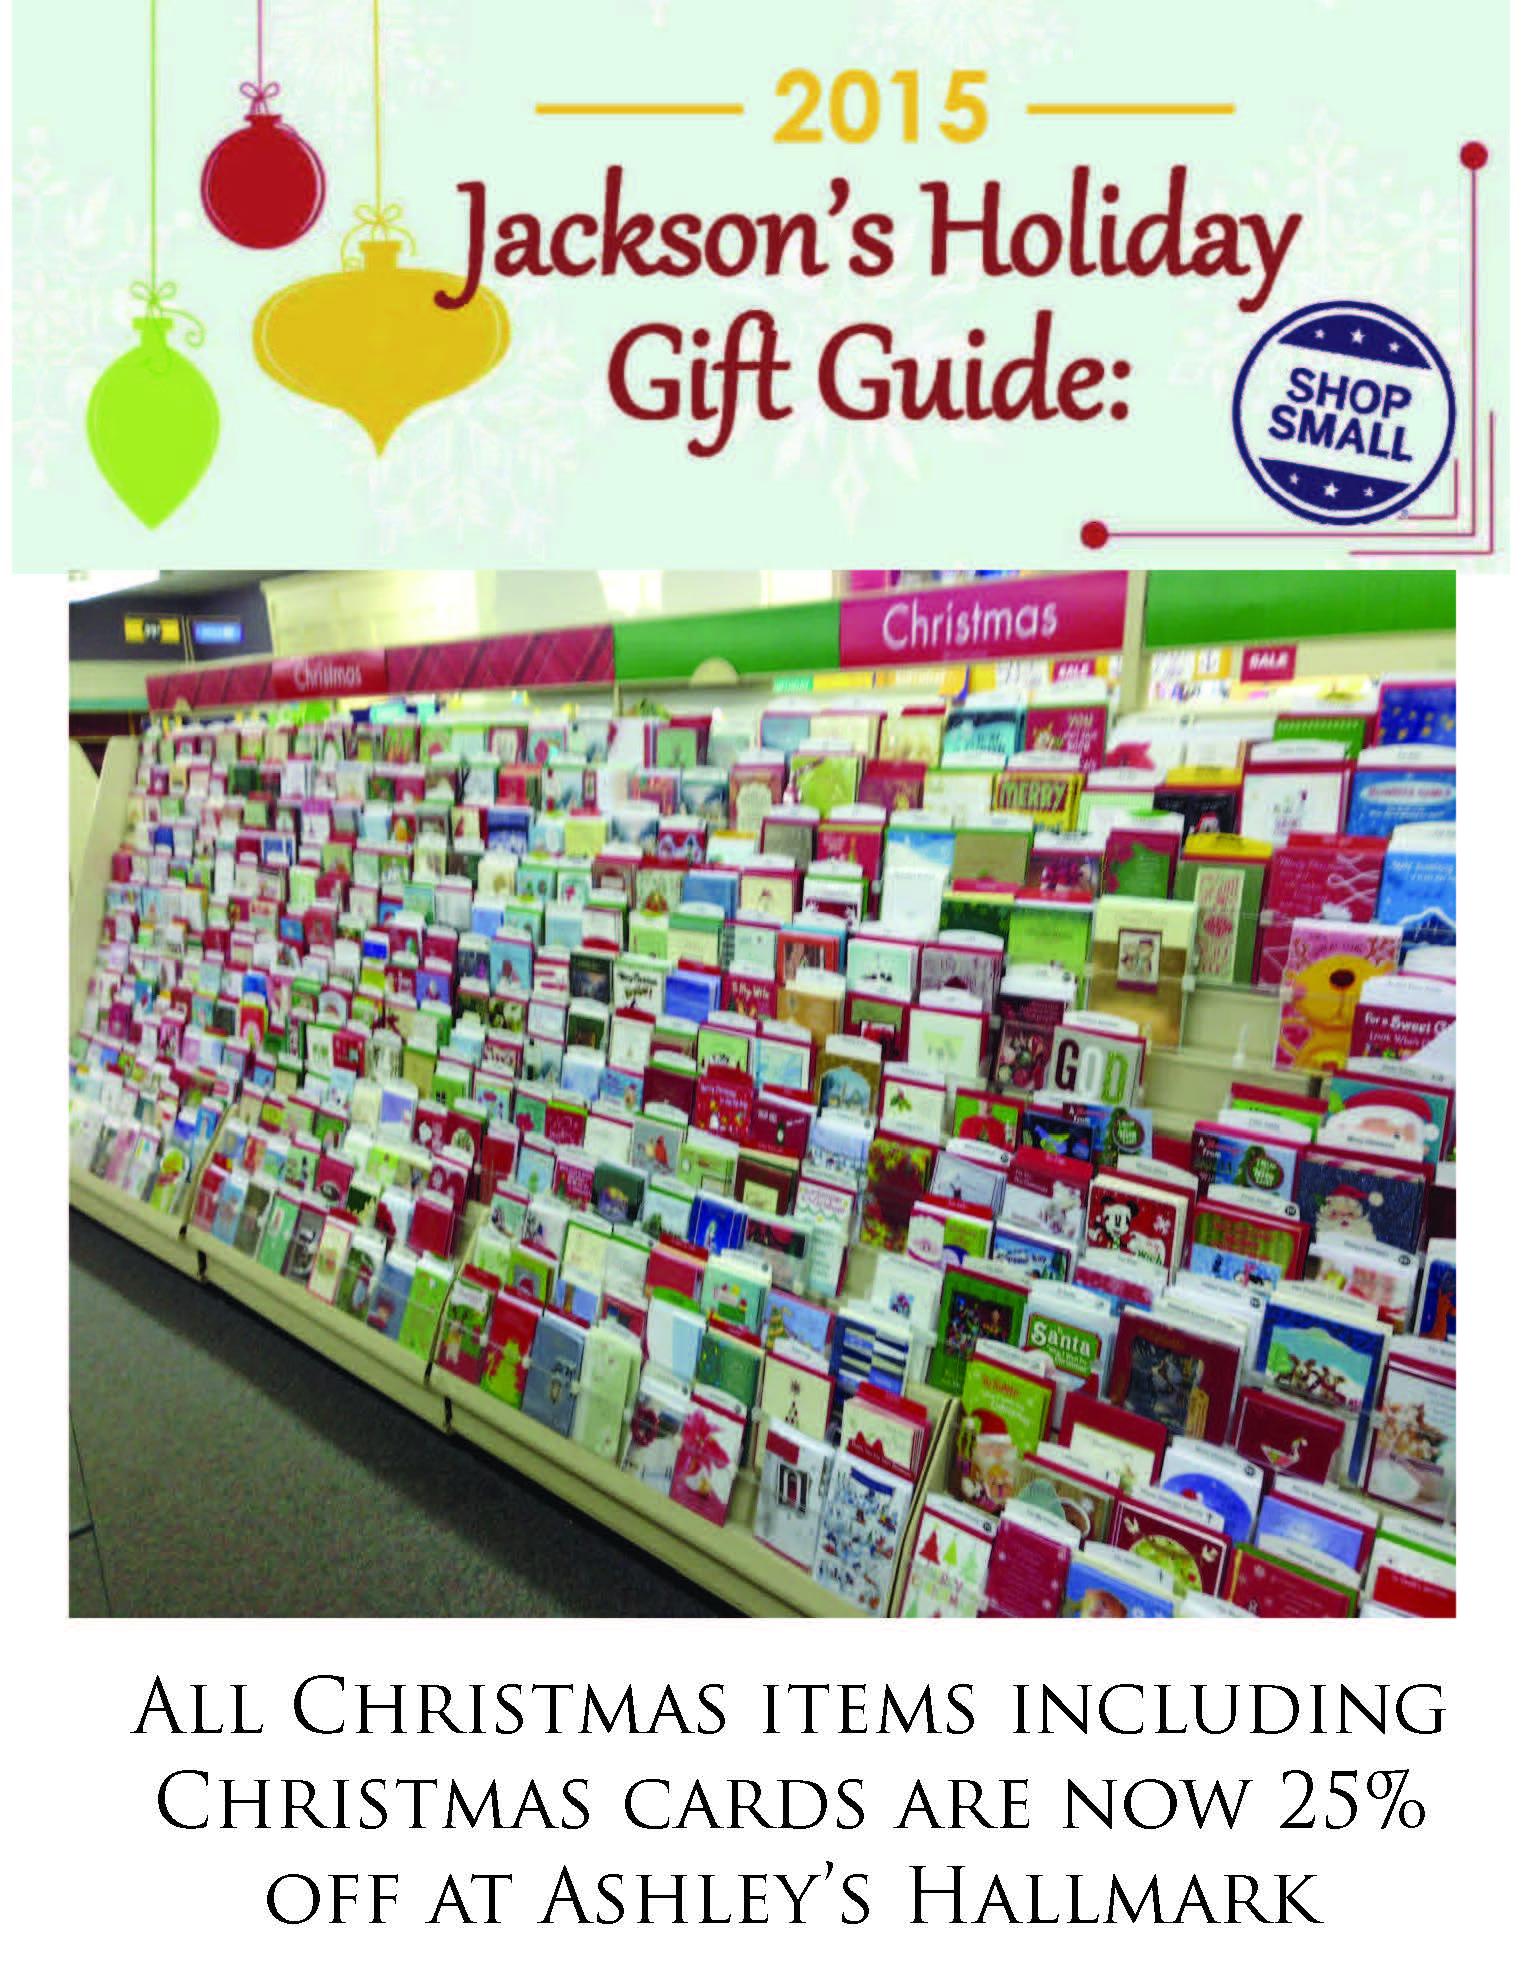 Gift_Guide_AshleyH.jpg